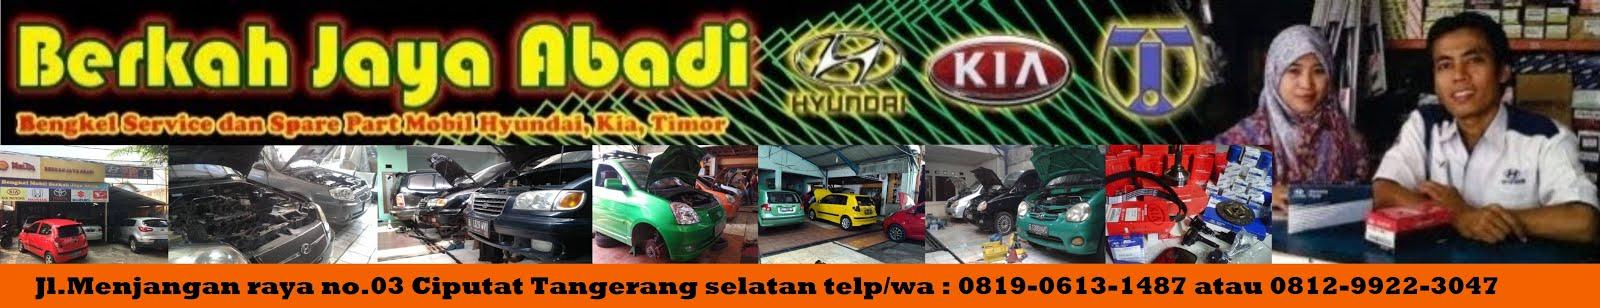 Bengkel Spare Part Hyundai Kia Timor BERKAH JAYA ABADI 081299223047